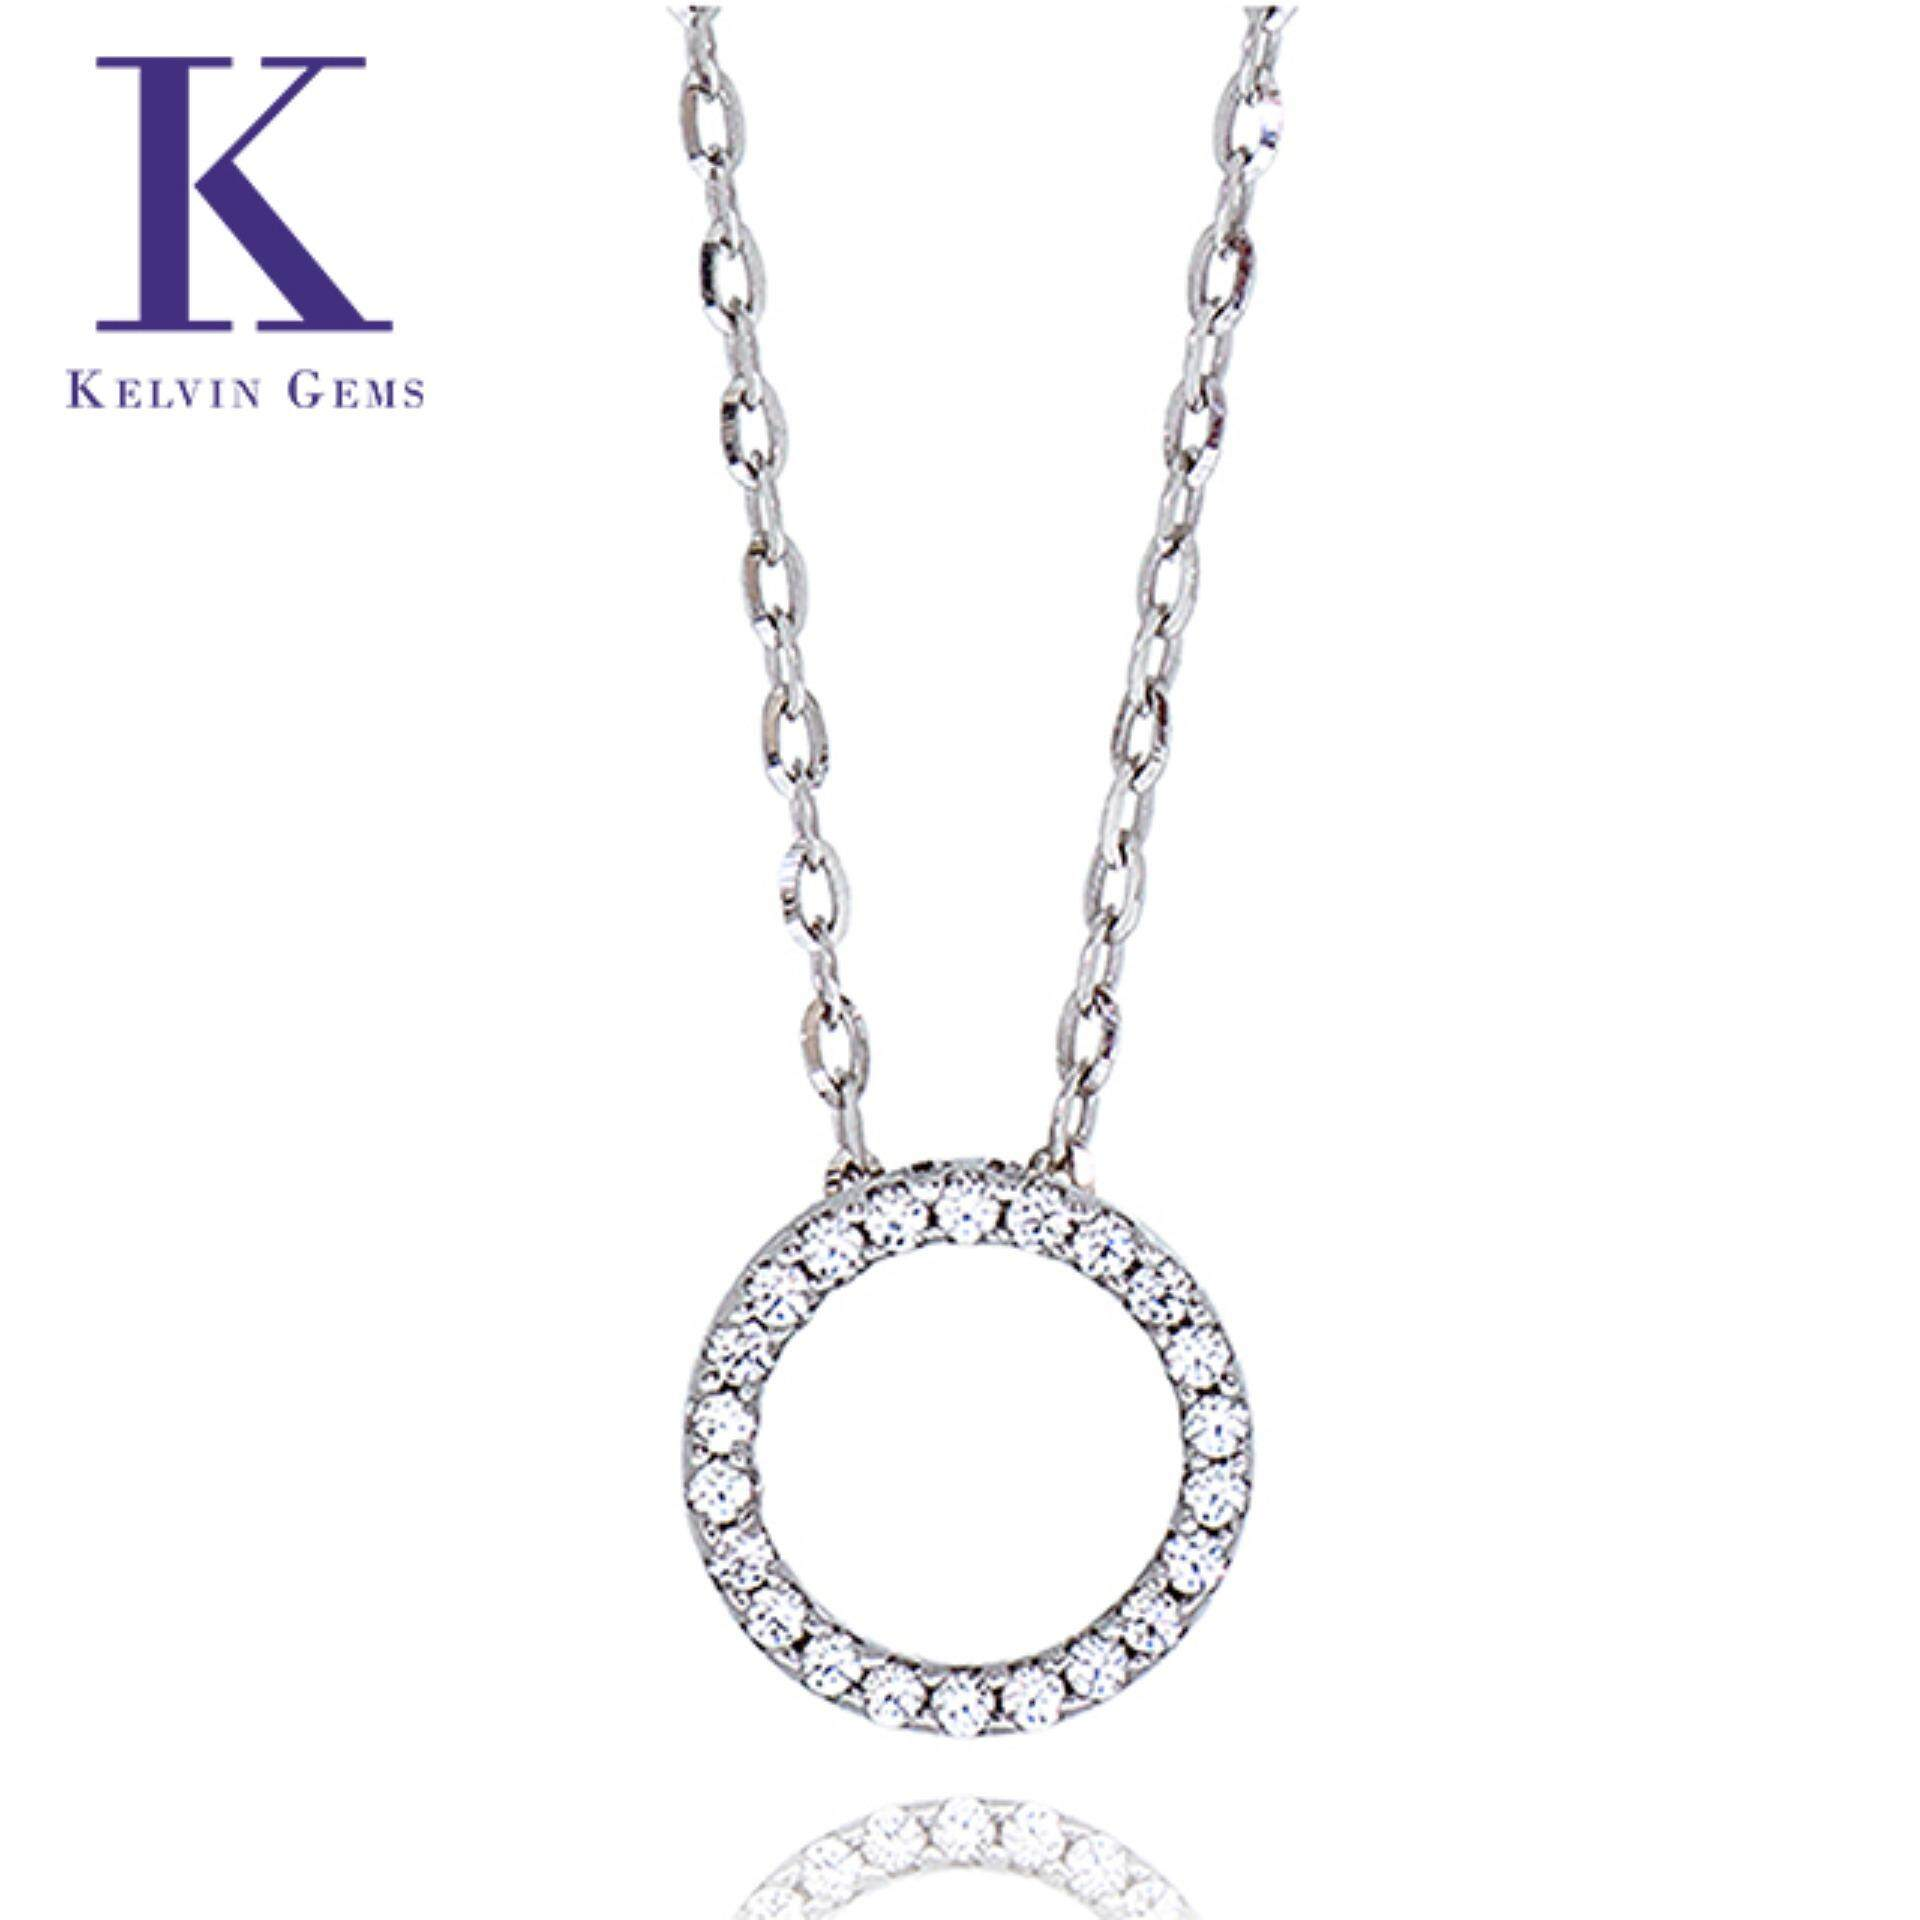 Kelvin Gems Premium Multiway Ring (Small) Pendant Necklace m/w Swarovski Zirconia